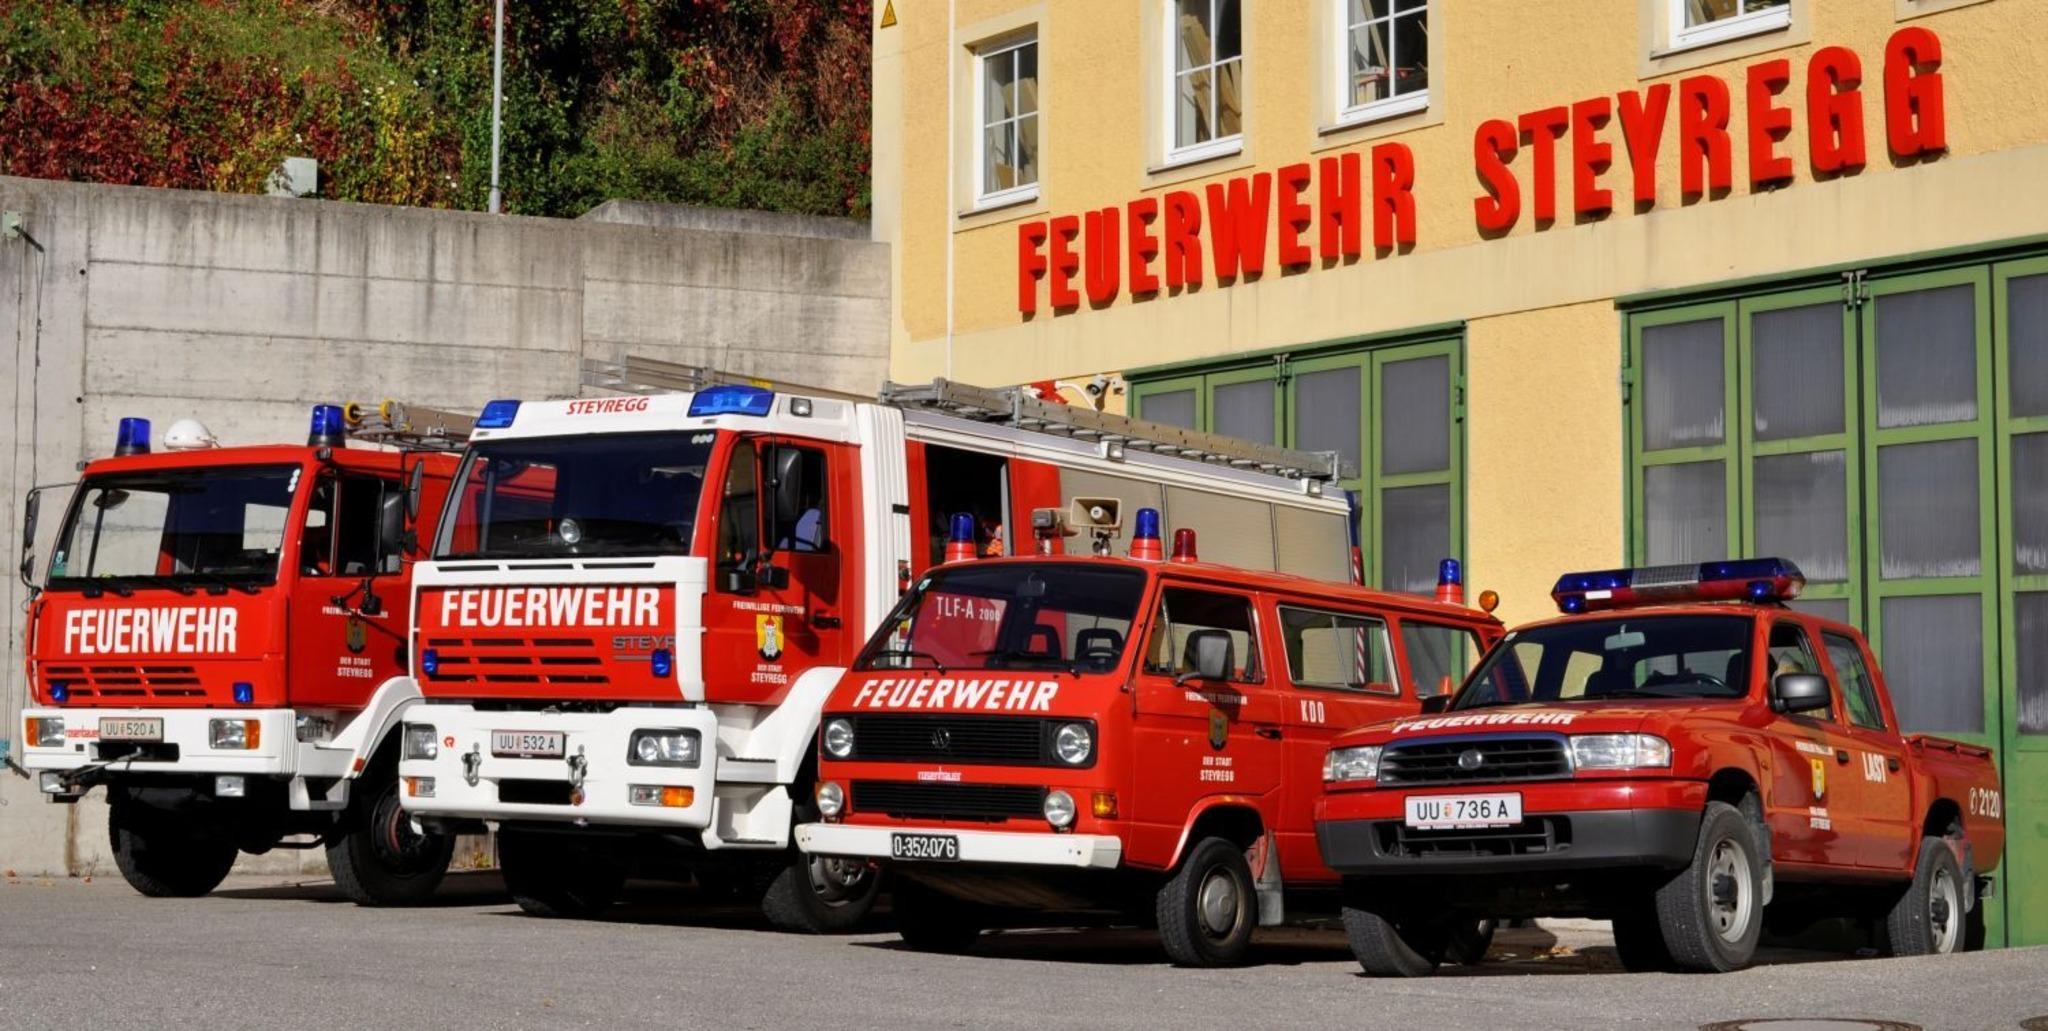 Team - Pfarrcaritas-Kindergarten Steyregg - Dizese Linz